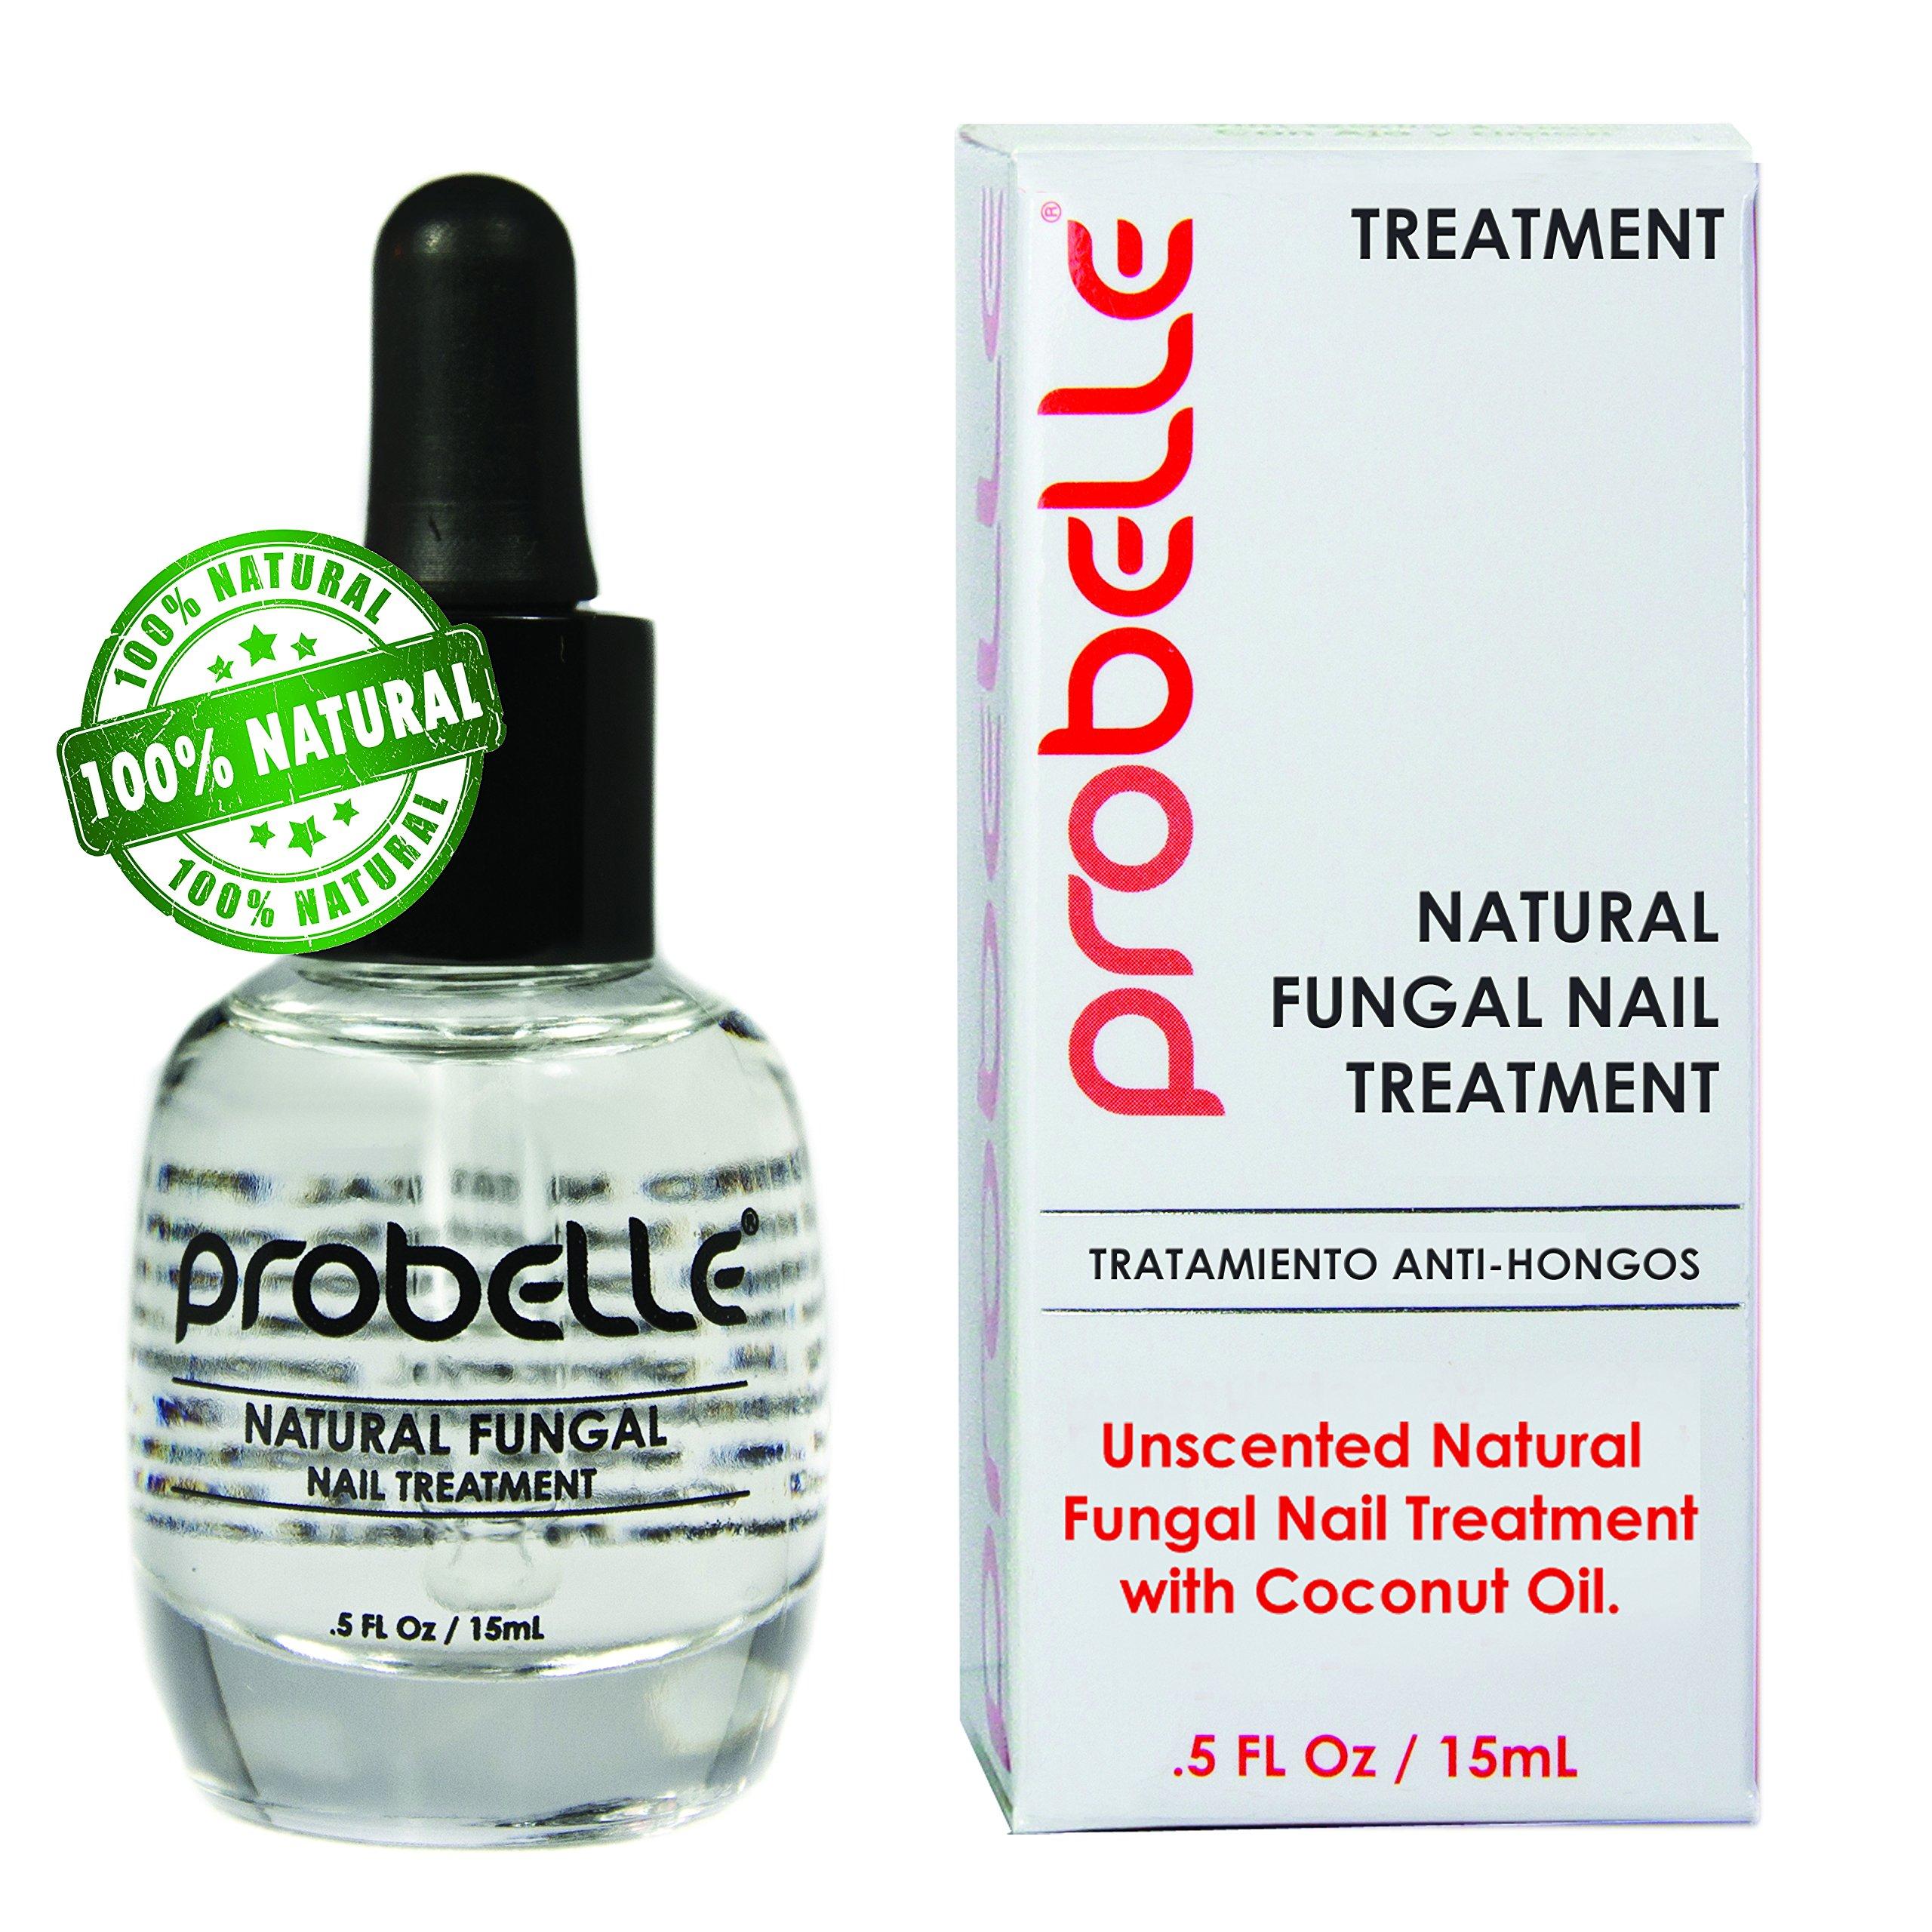 Probelle Natural Fungal Nail Treatment, Anti Fungal Nail Treatment, Nail Color Restoration, Clear.5 oz/ 15 ml (Patented Formula)